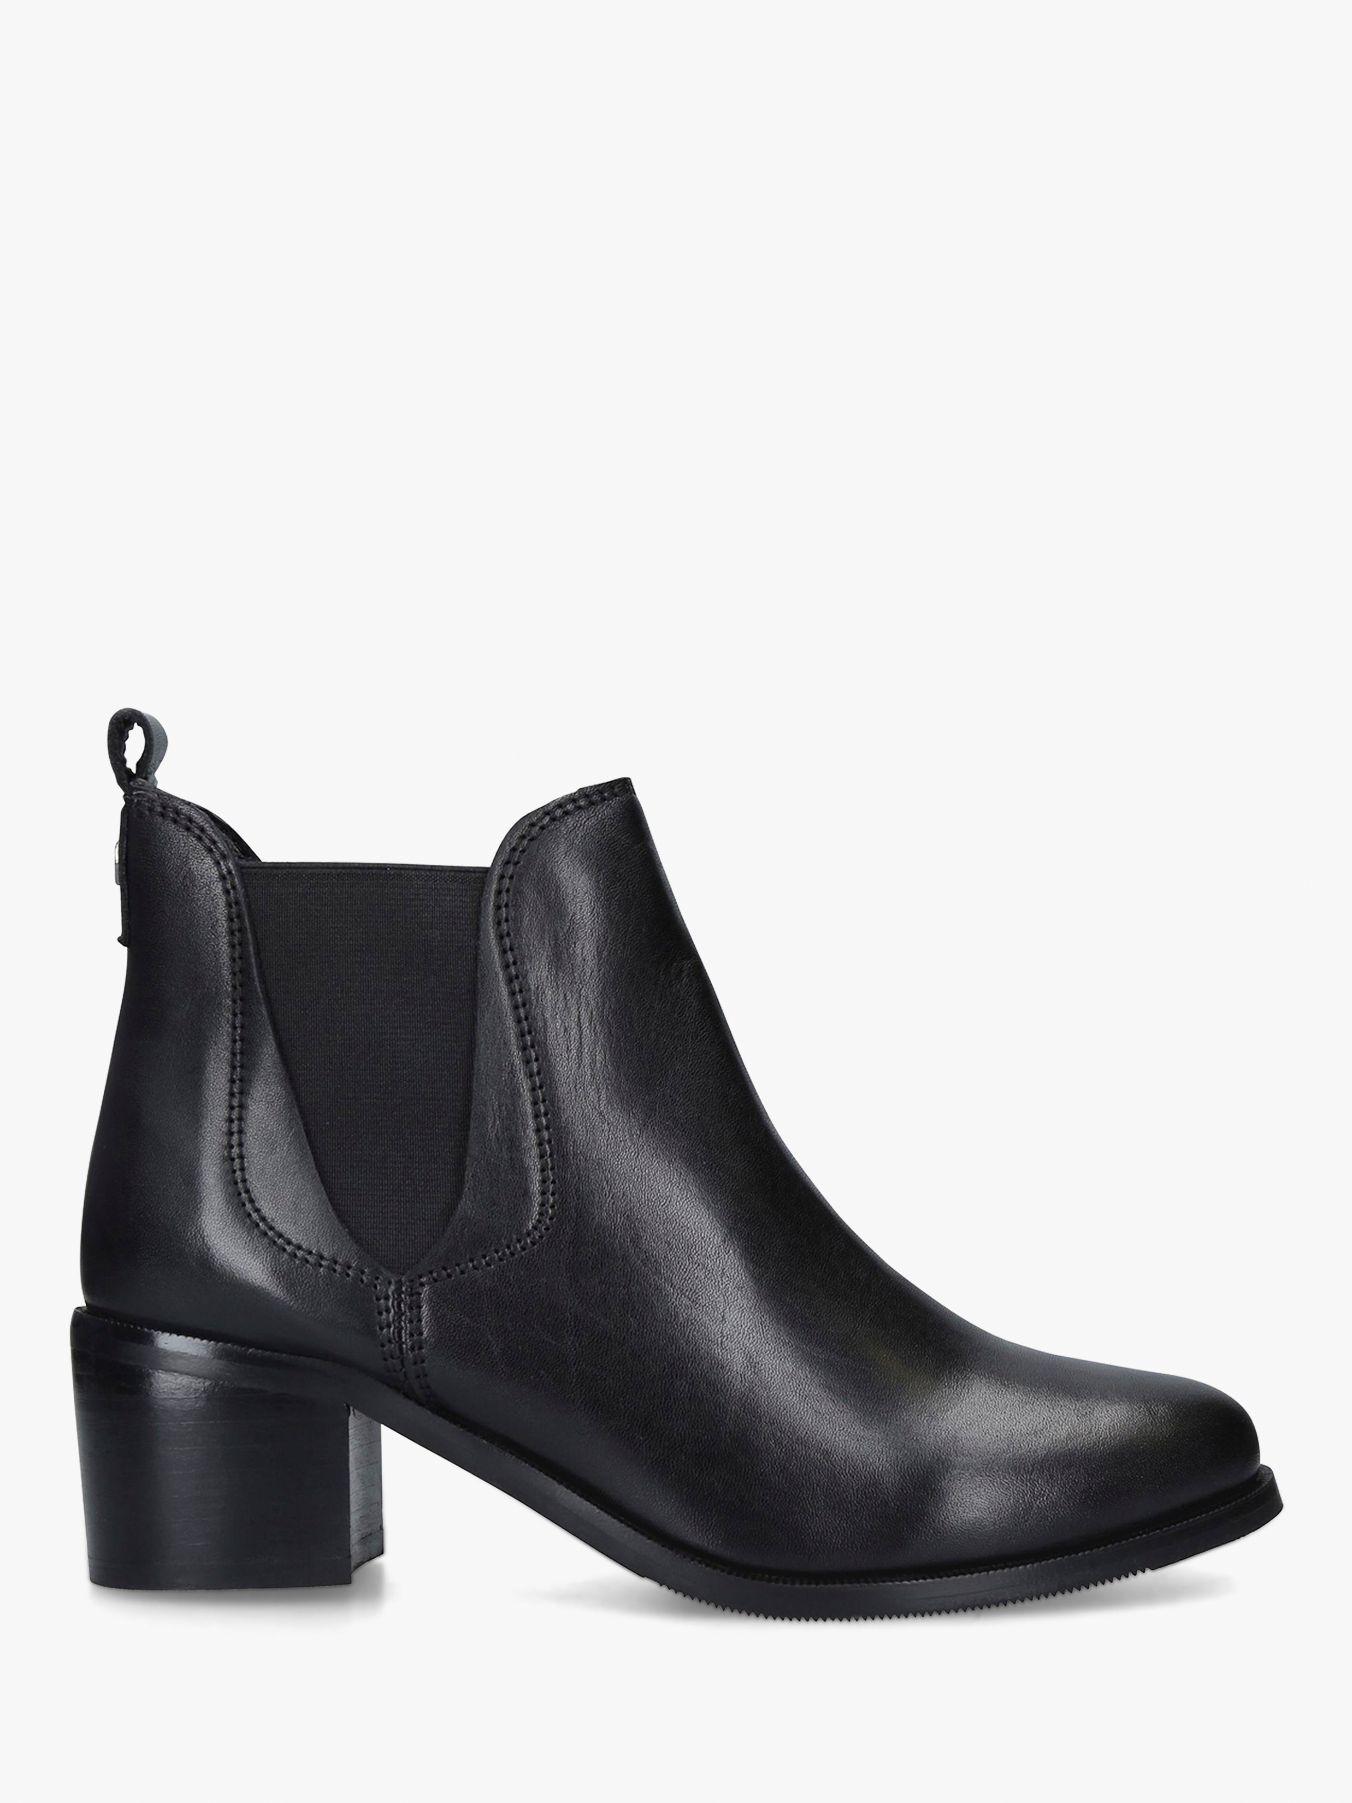 Carvela Comfort Carvela Comfort Ronald Block Heel Leather Ankle Boots